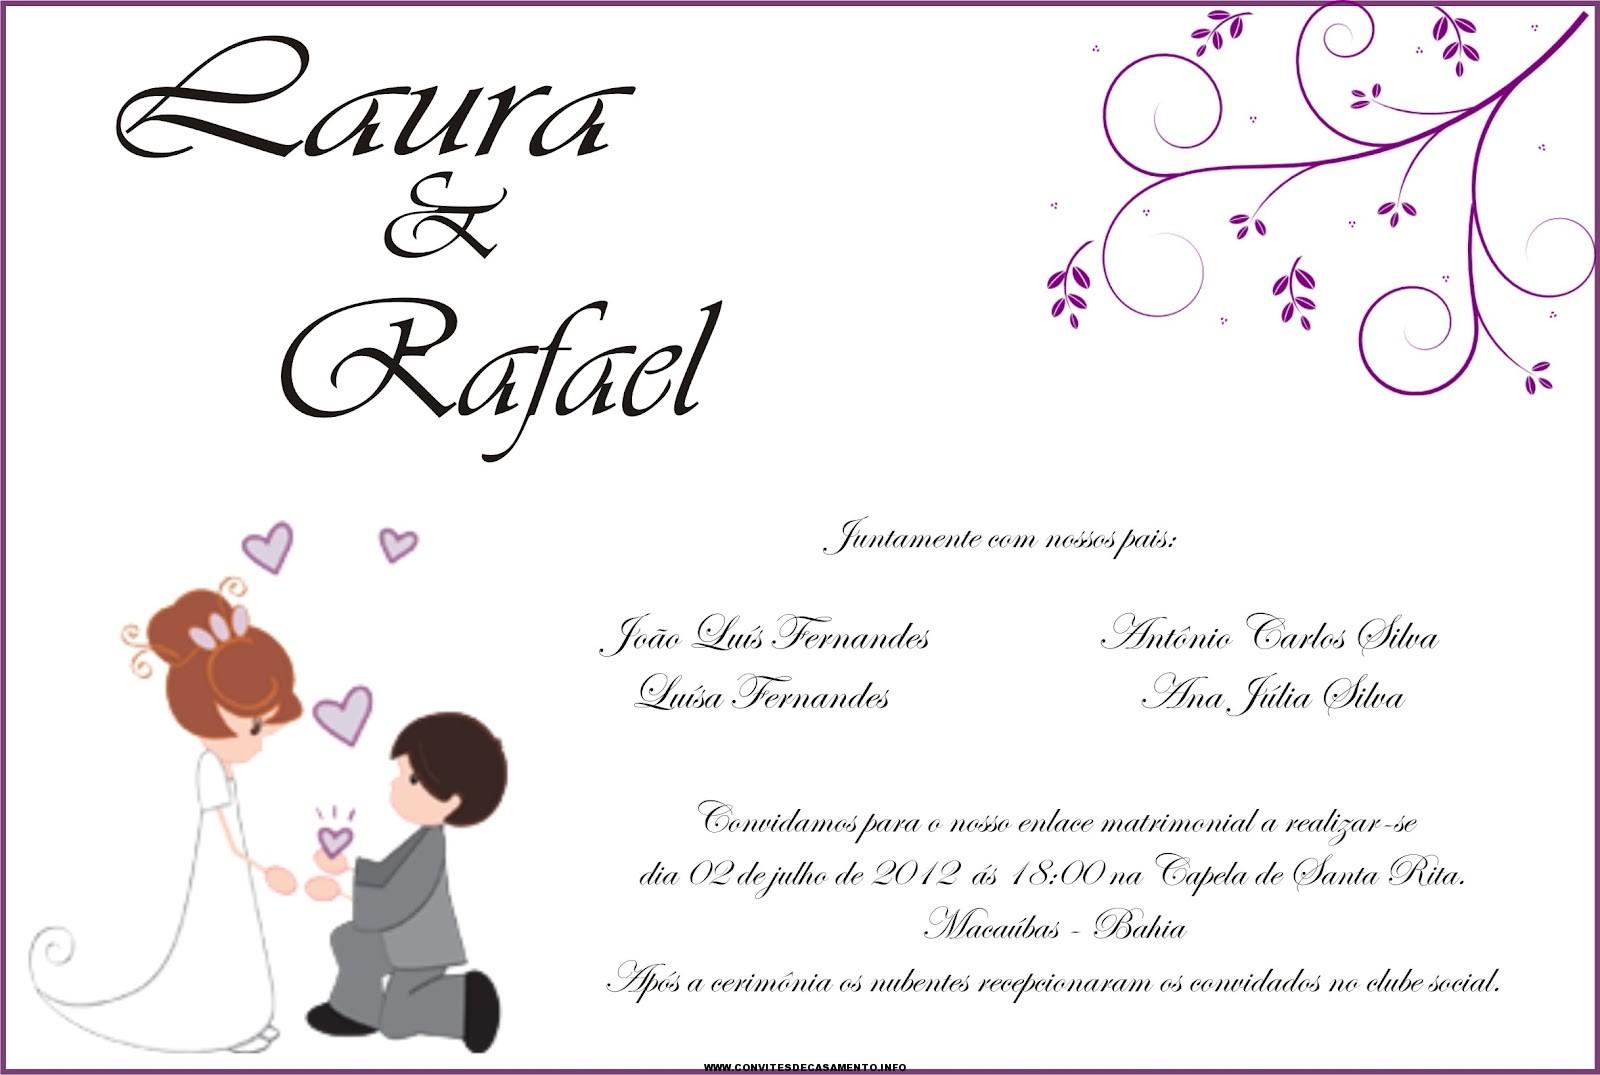 montar convites de casamento online dating